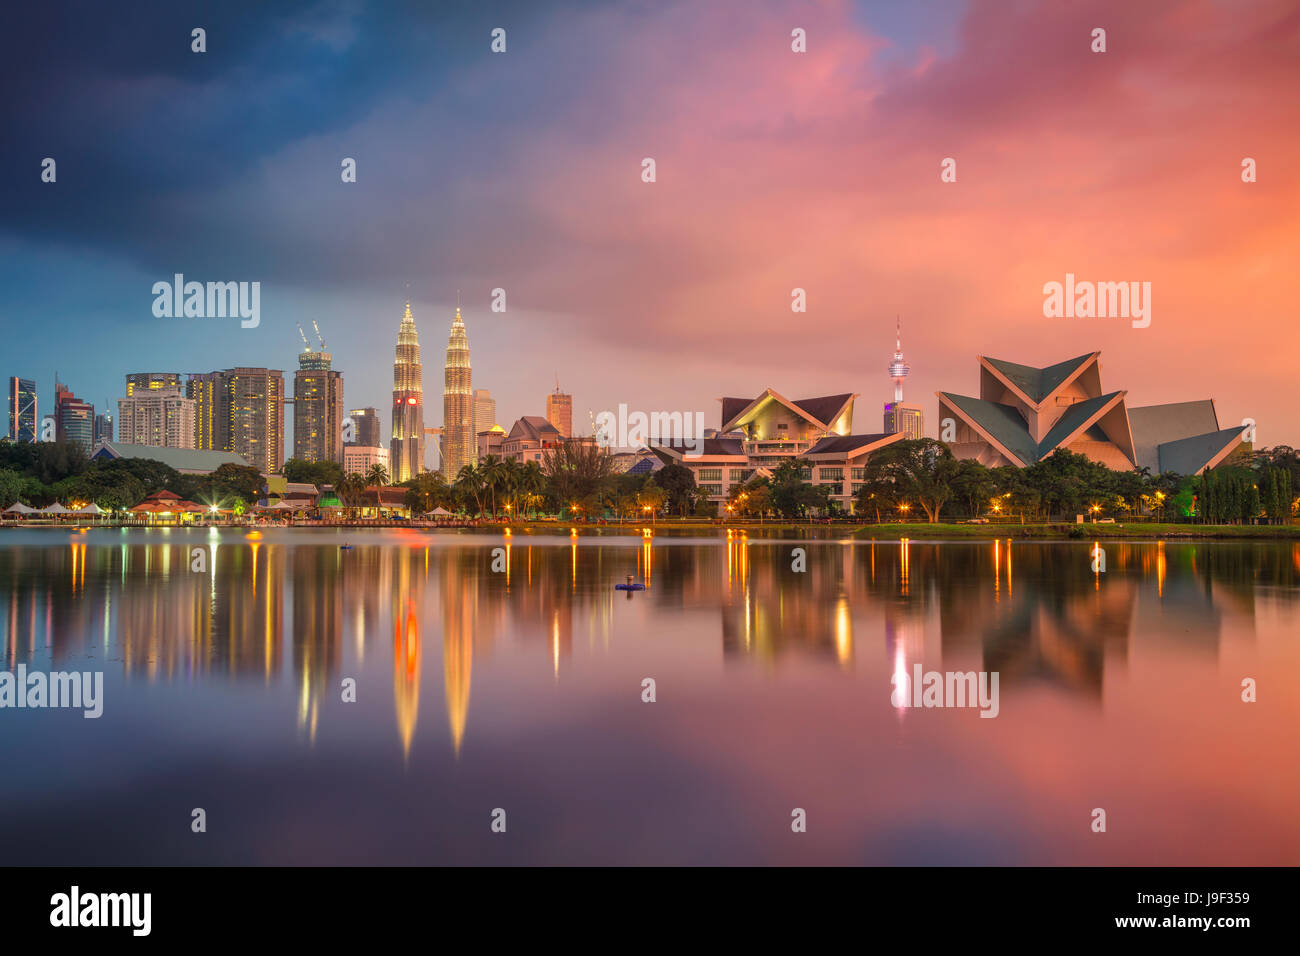 Kuala Lumpur. Imagen del paisaje urbano de Kuala Lumpur, Malasia, durante la puesta de sol. Imagen De Stock